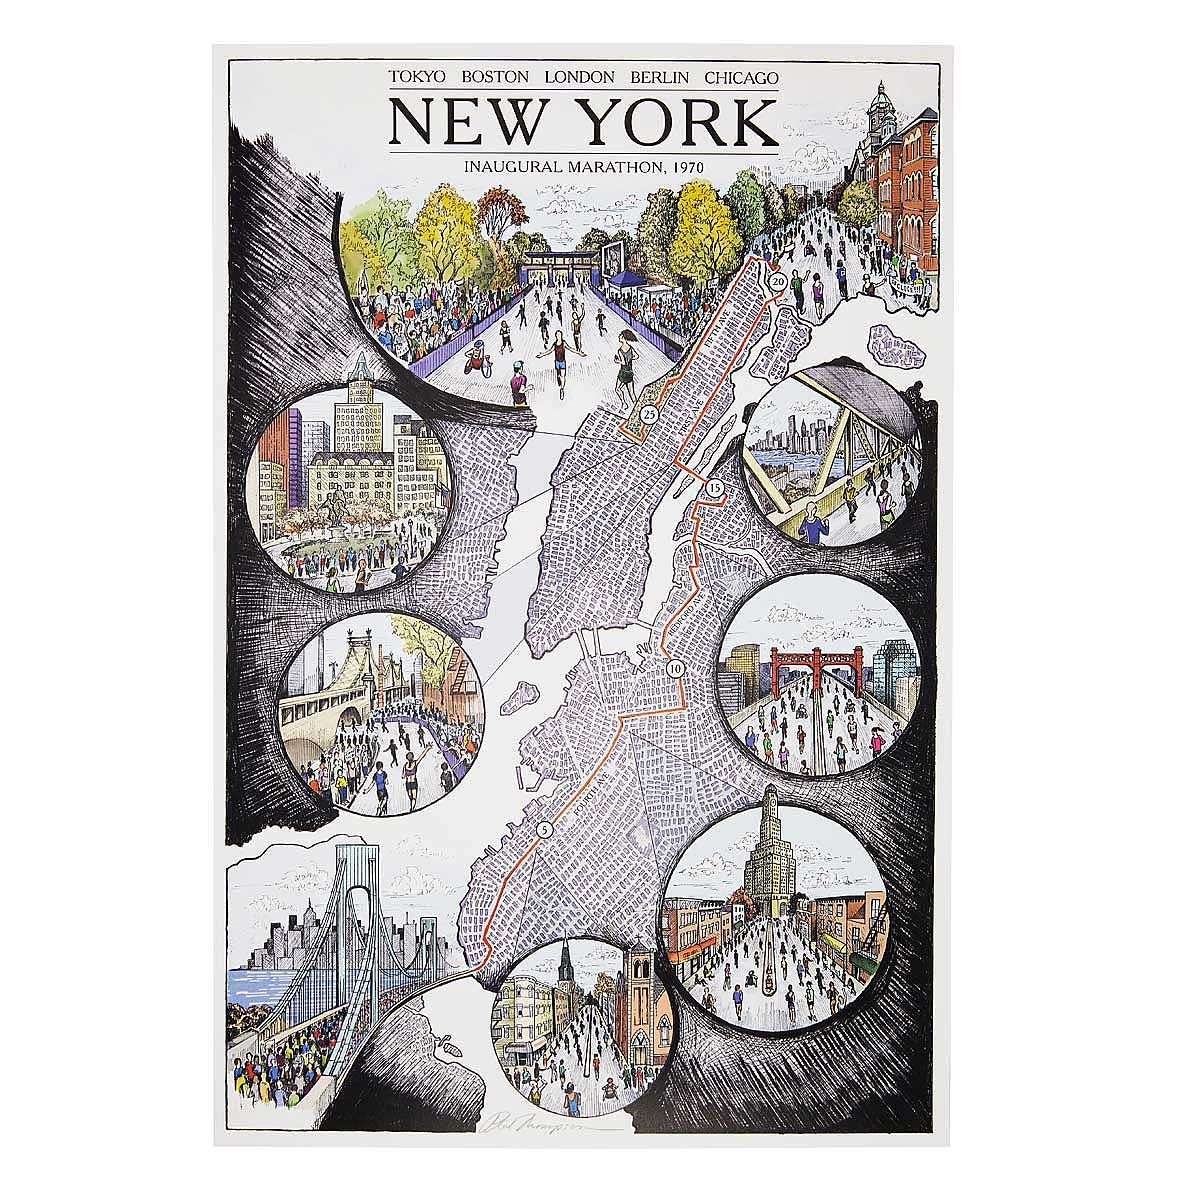 New York Marathon Map New York Marathon Artwork Route Map - Chicago map new york